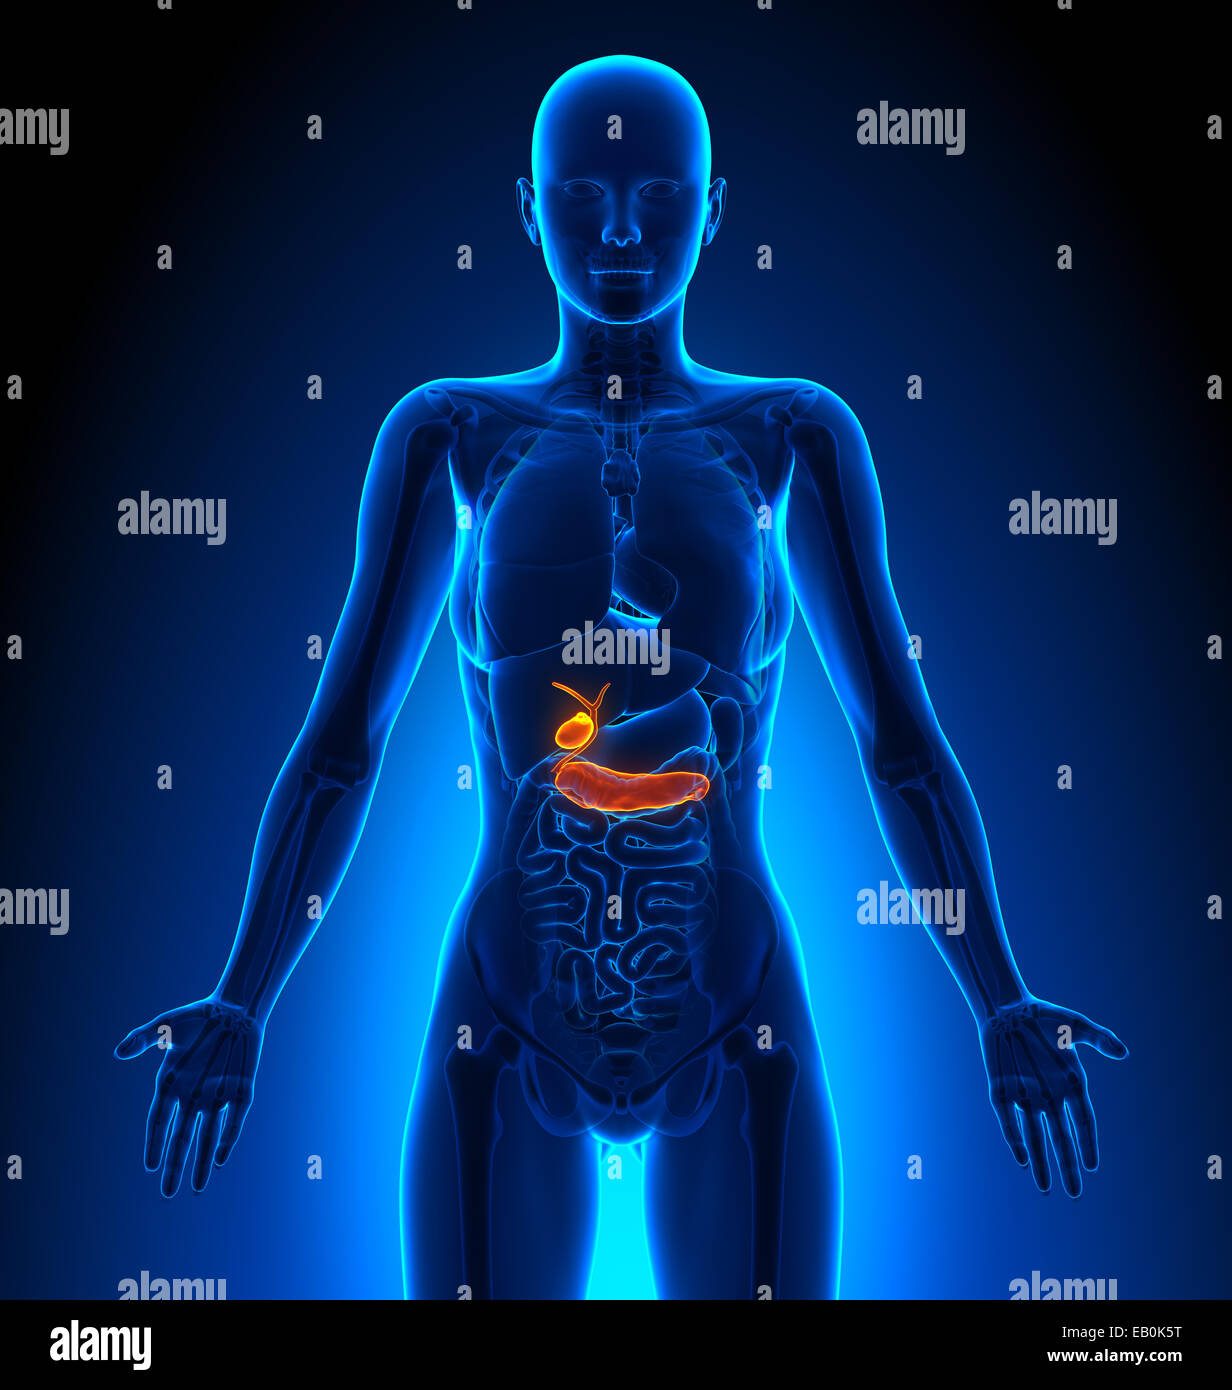 Vesícula biliar / Páncreas - órganos femeninos - Anatomía Humana ...